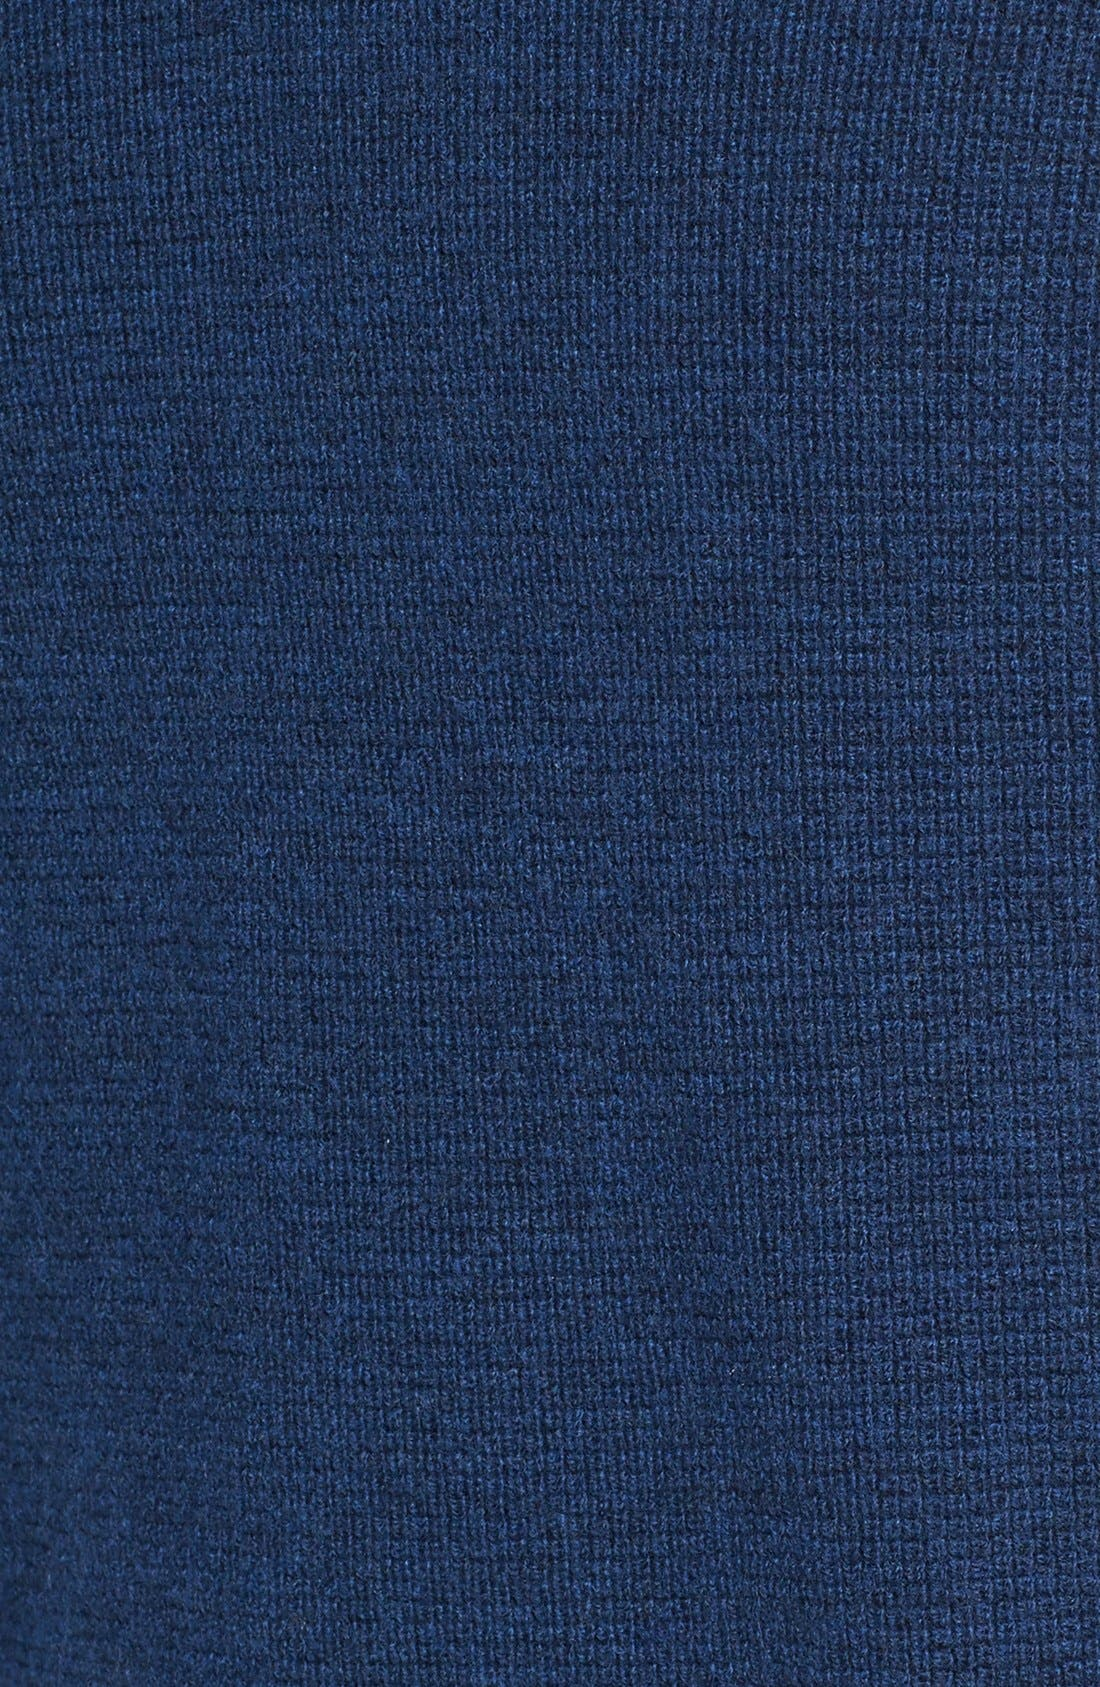 V-Neck Colorblock Merino Wool Pullover,                             Alternate thumbnail 5, color,                             Blue